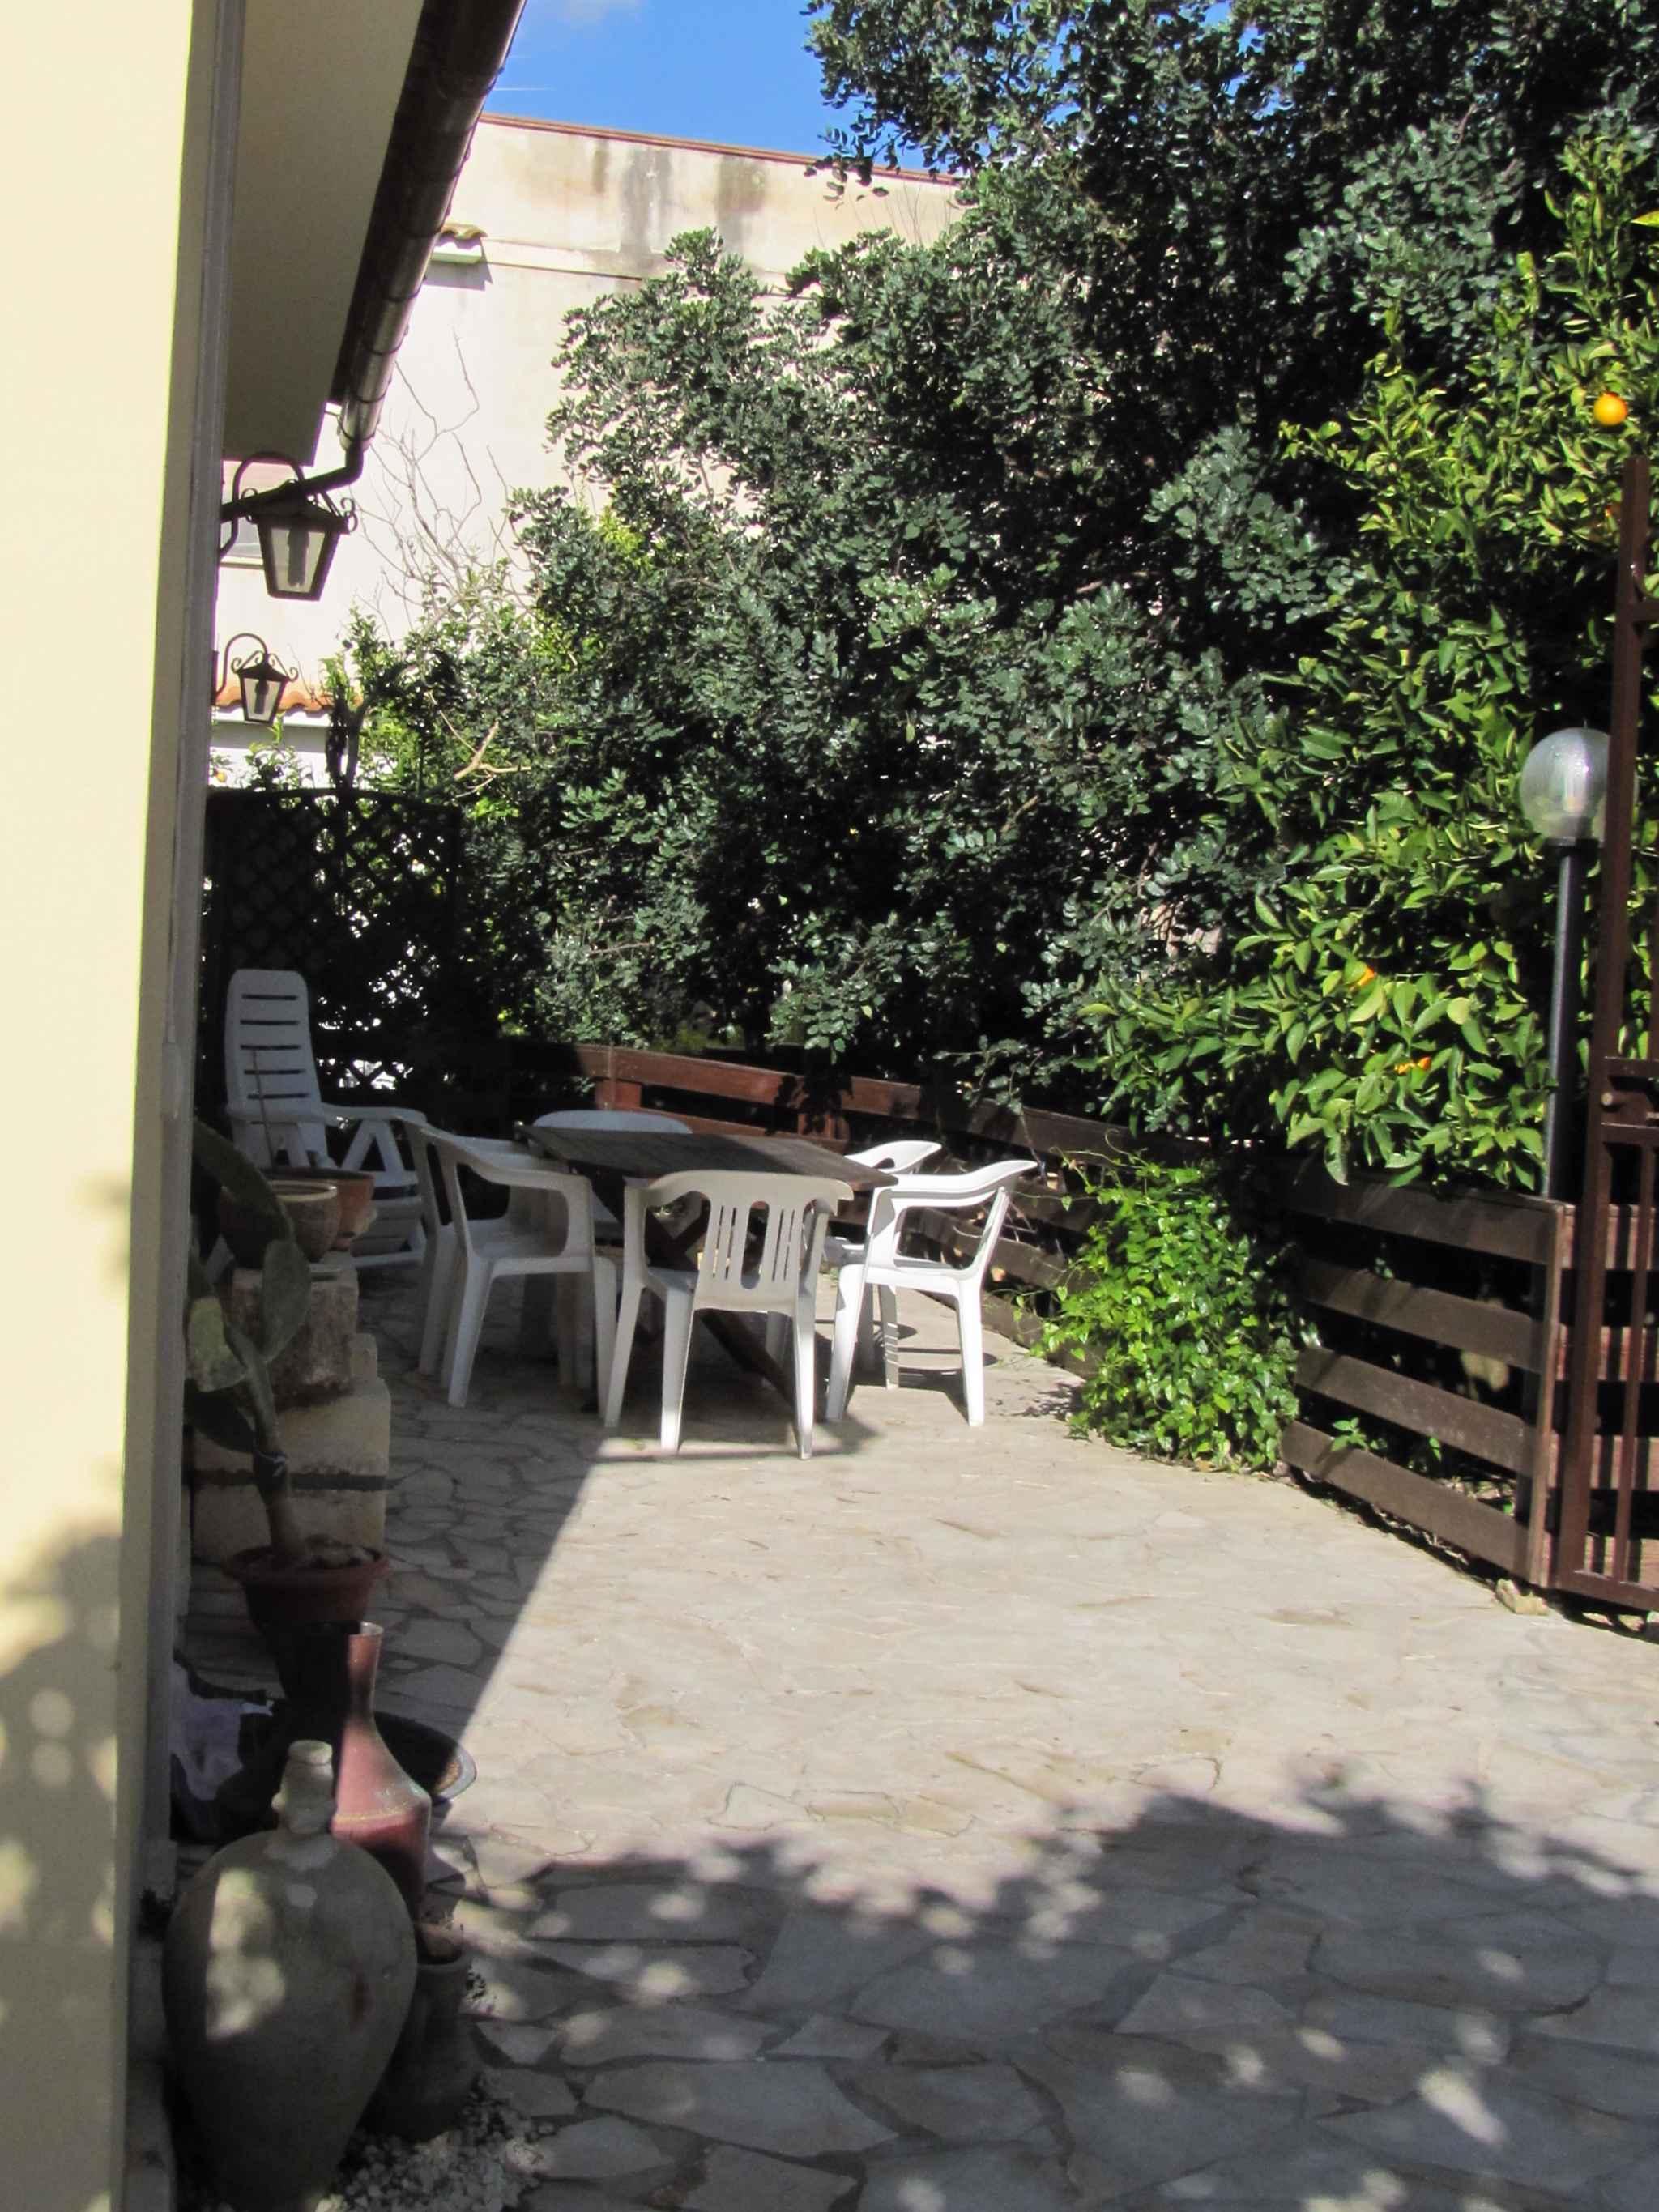 Maison de vacances mit Blick auf Zitronengarten (317534), Lido di Noto, Siracusa, Sicile, Italie, image 11